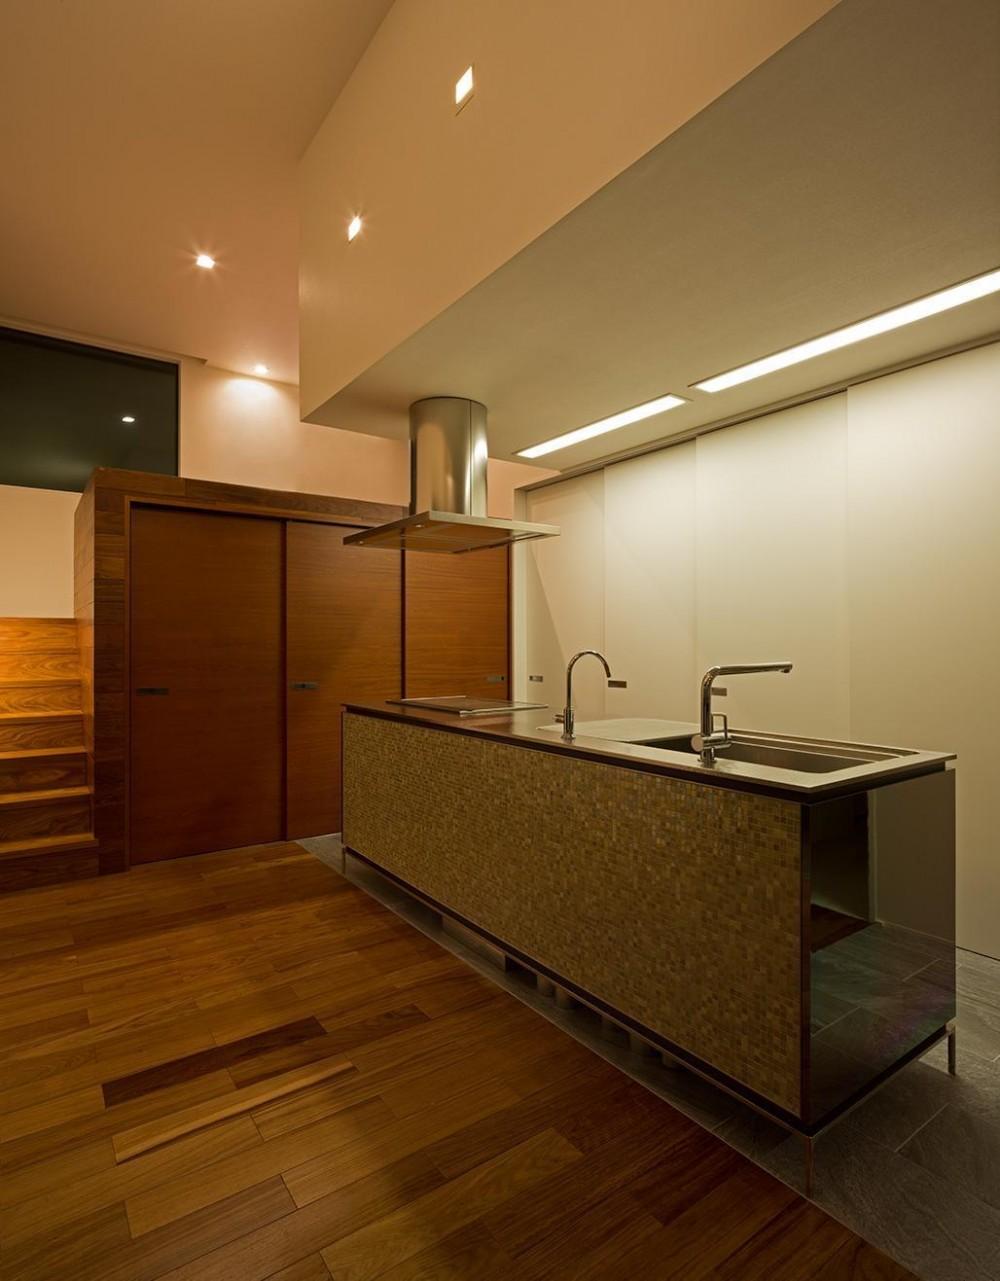 N8-house「Ⅲ-BOXの家」 (キッチン)